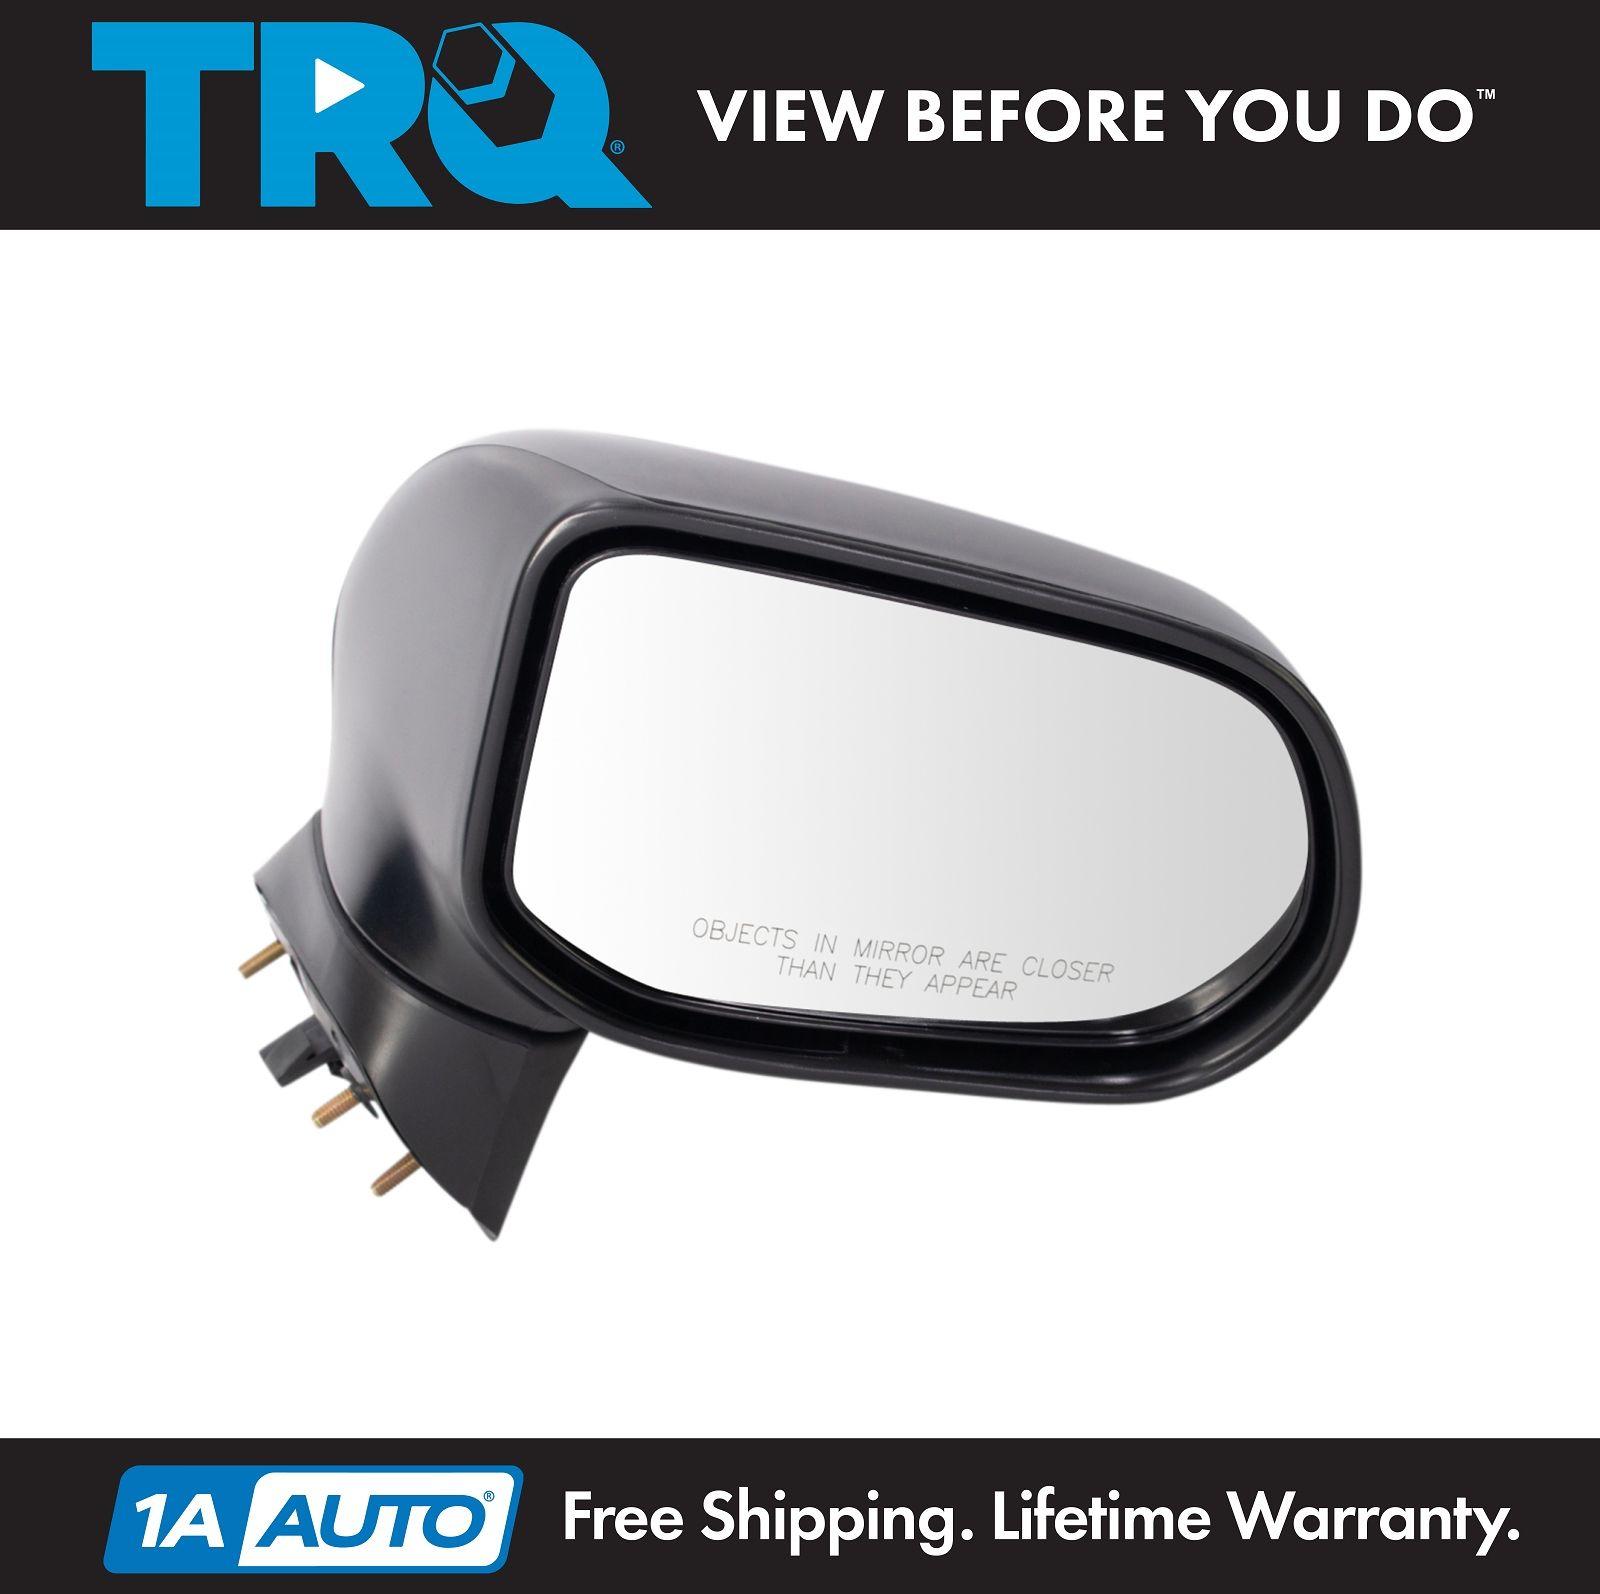 06-11 Civic EX LX 4-Door Sedan Power Black Rear View Mirror Right Passenger Side